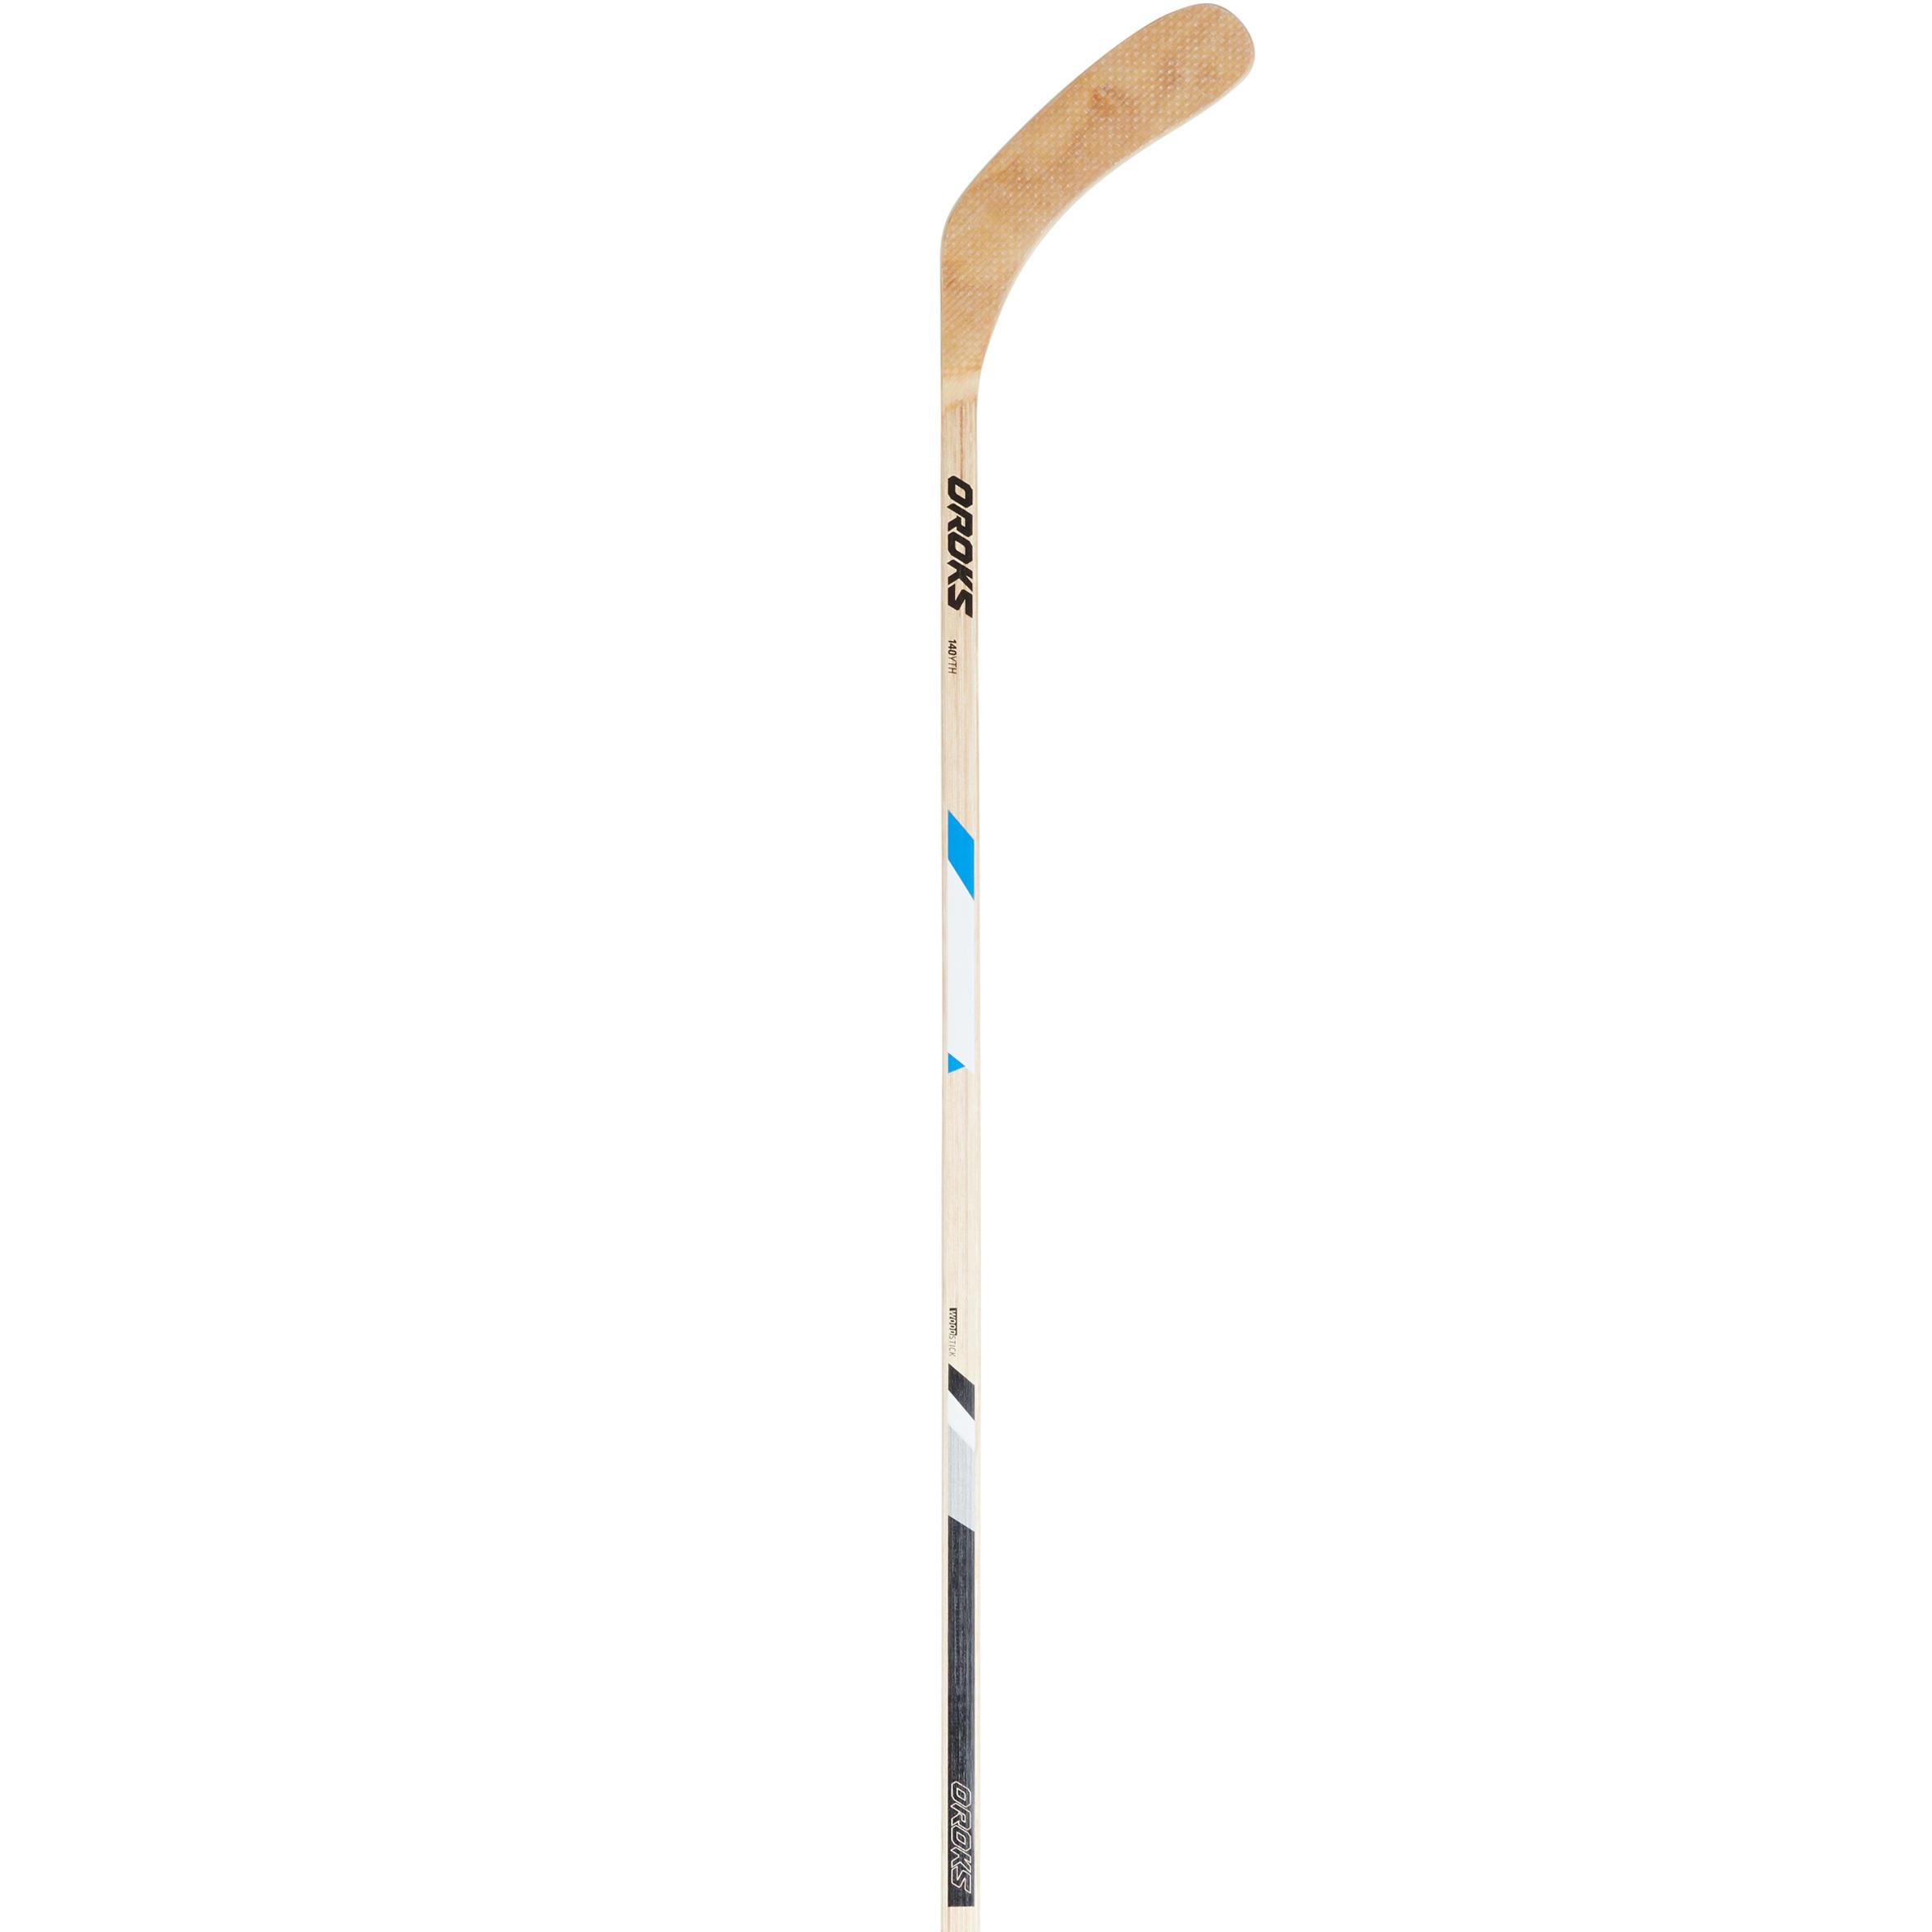 140 Kids' Hockey Stick